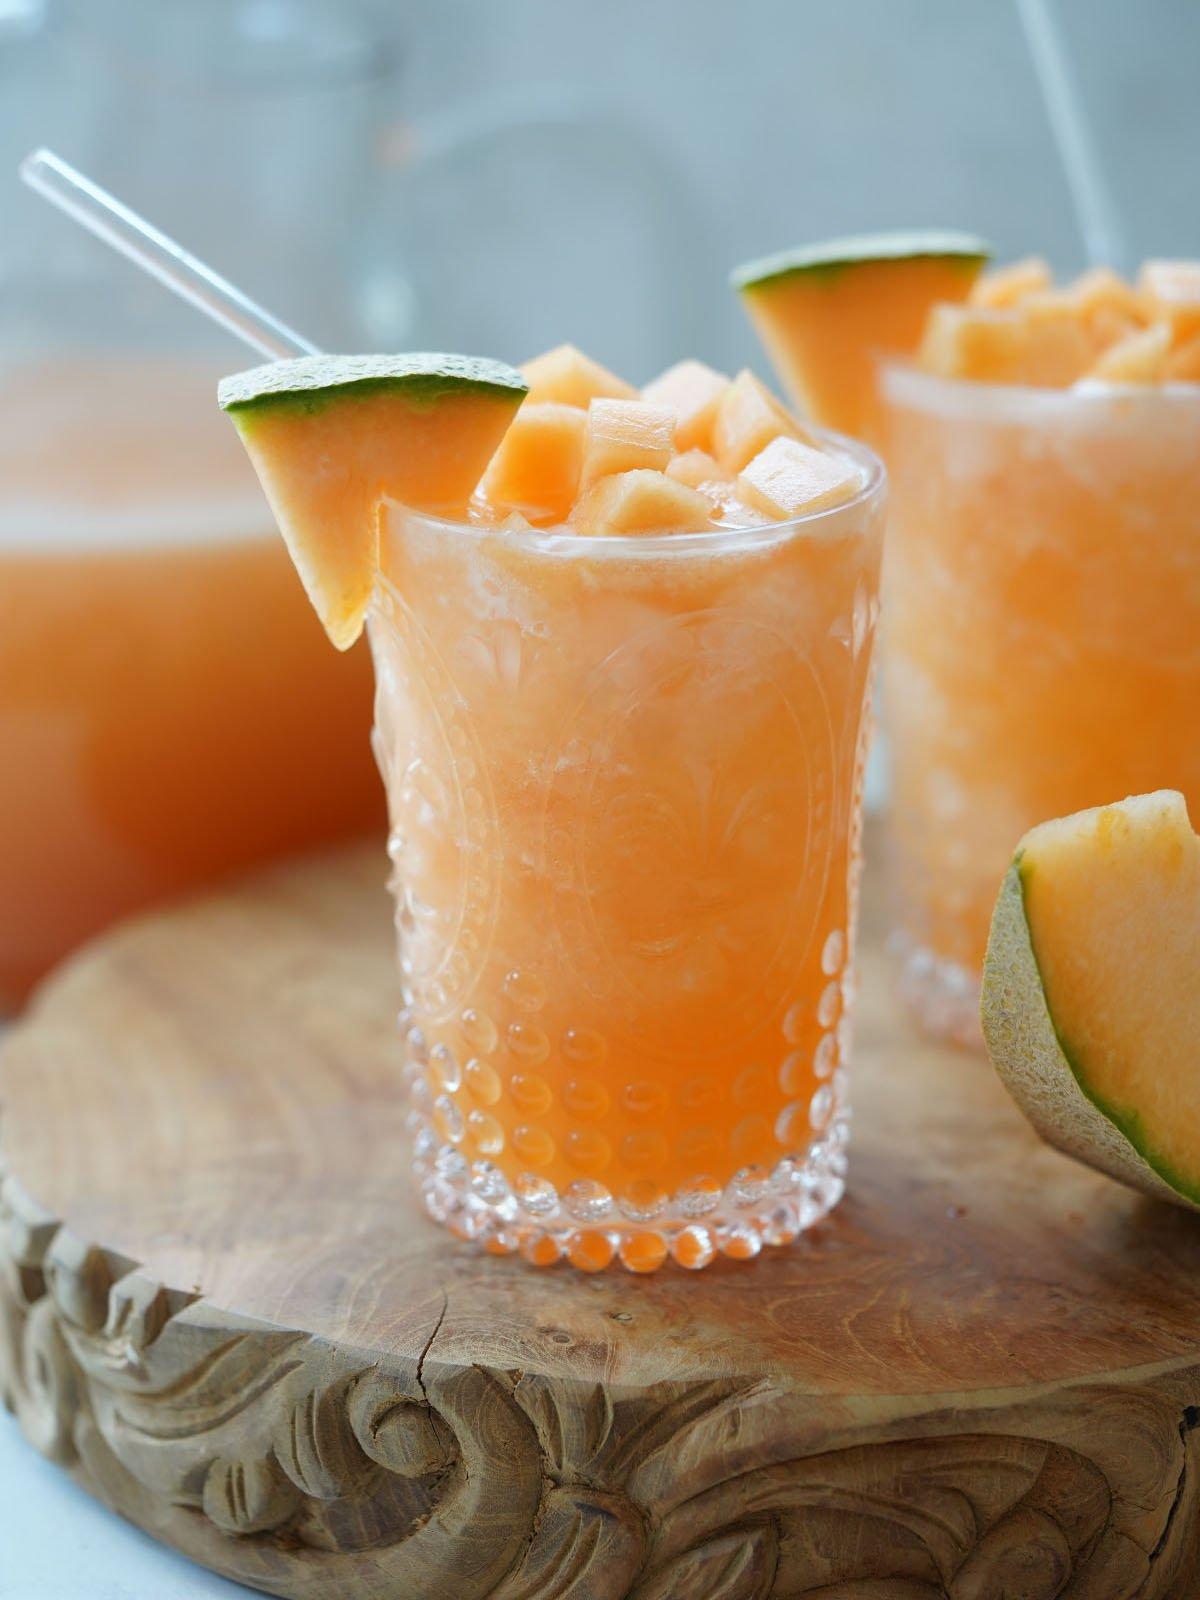 A glass with agua de melon topped with cantaloupe chunks.